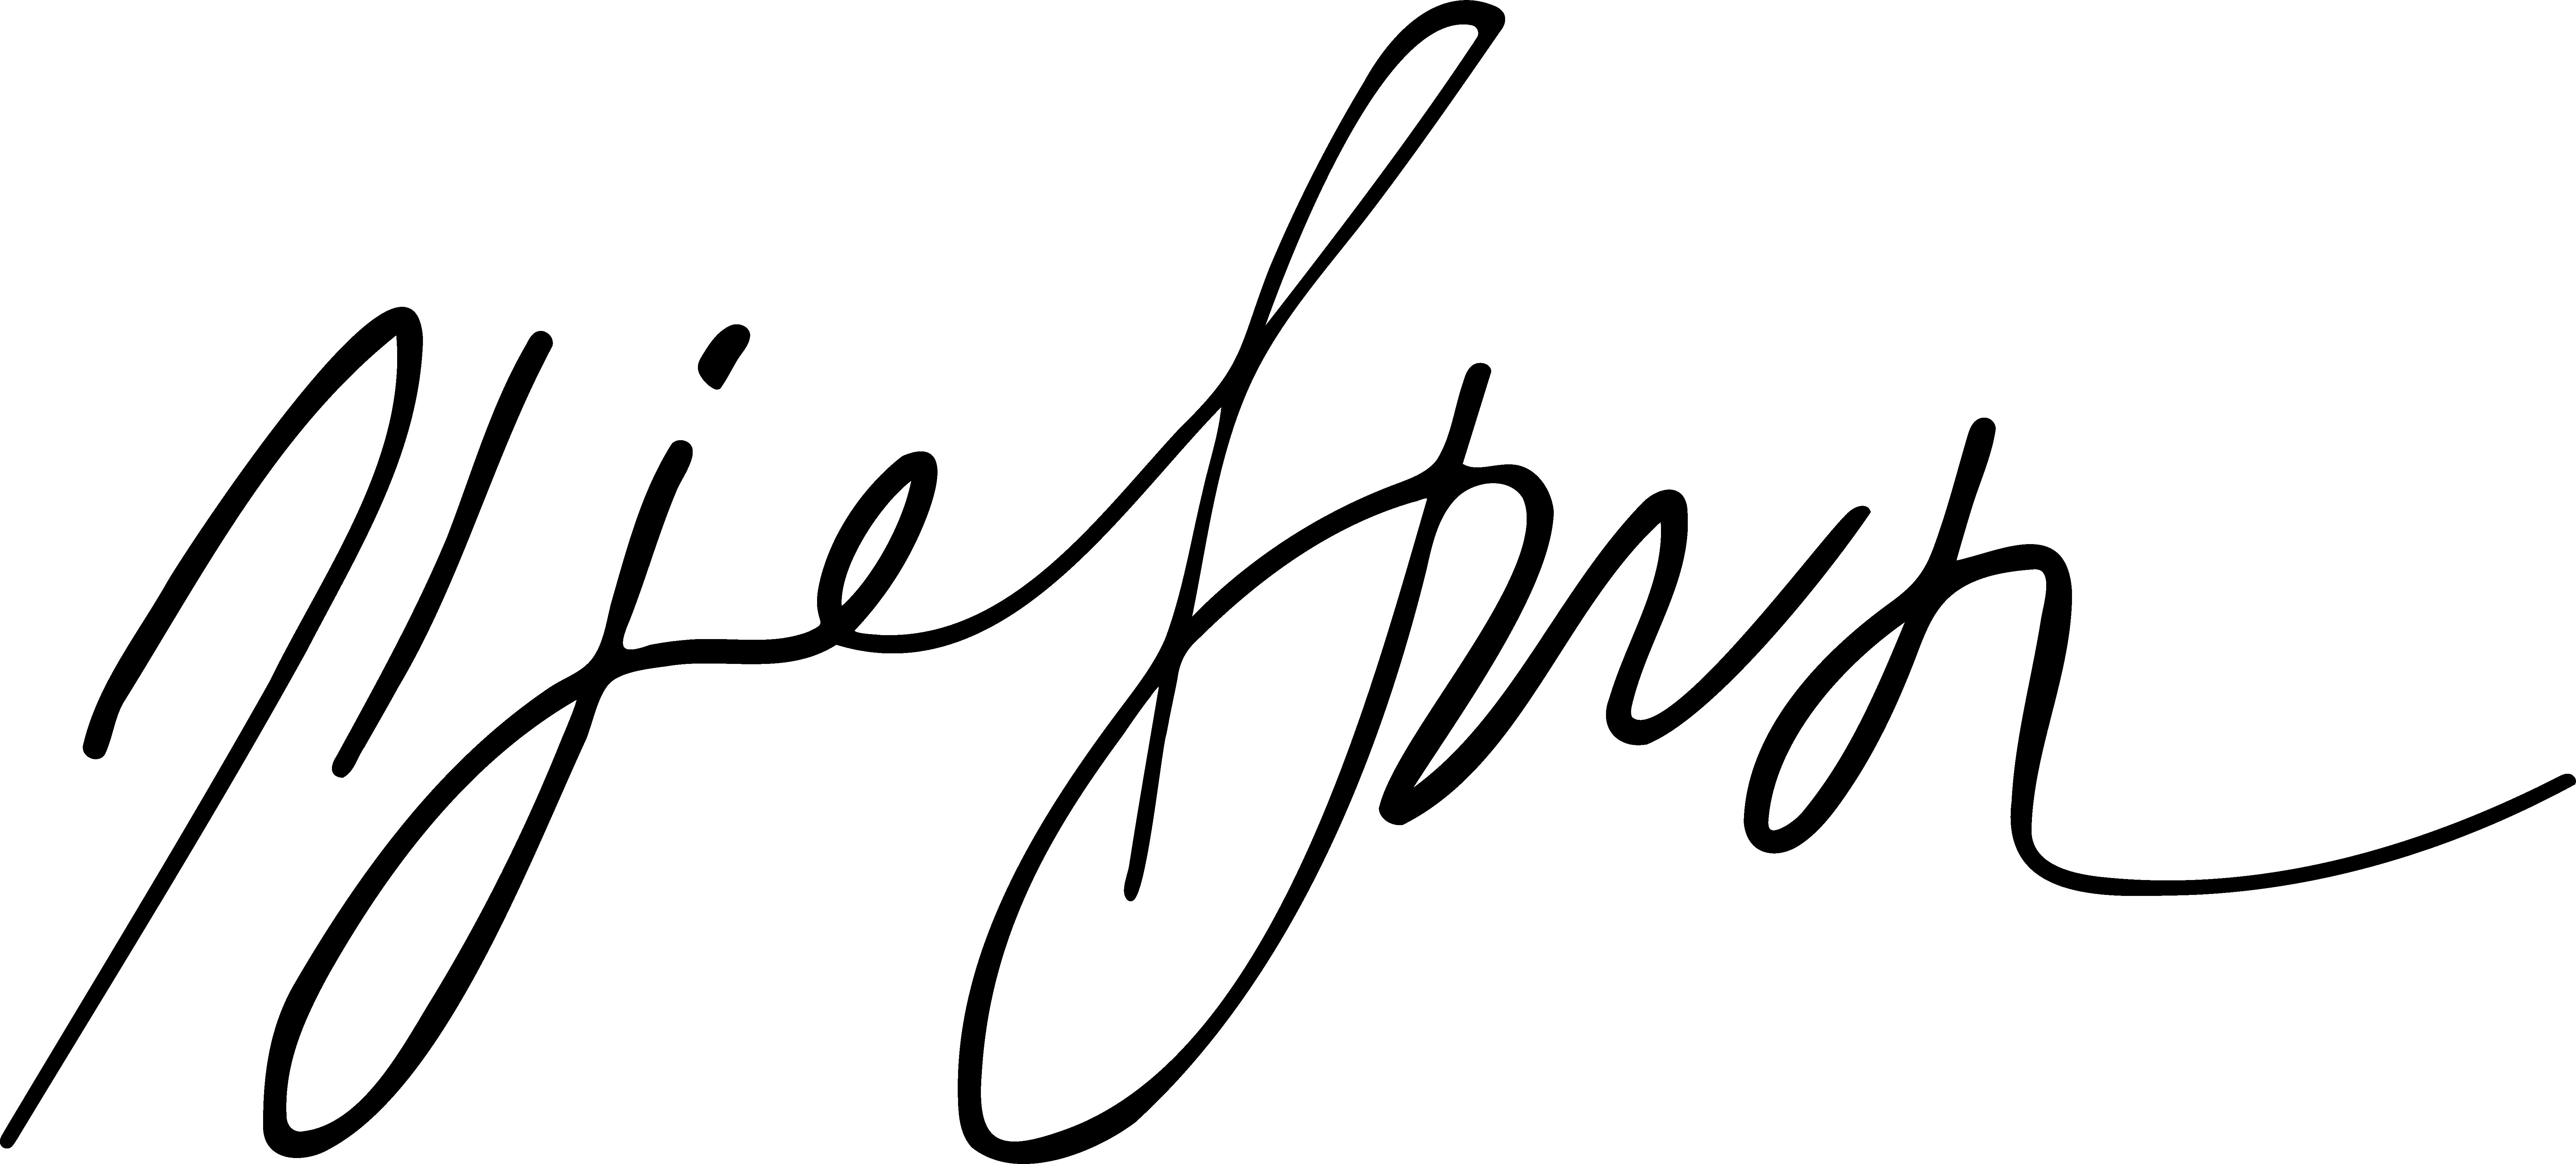 Signature_2020_NIJEL_PUR-01.PNG